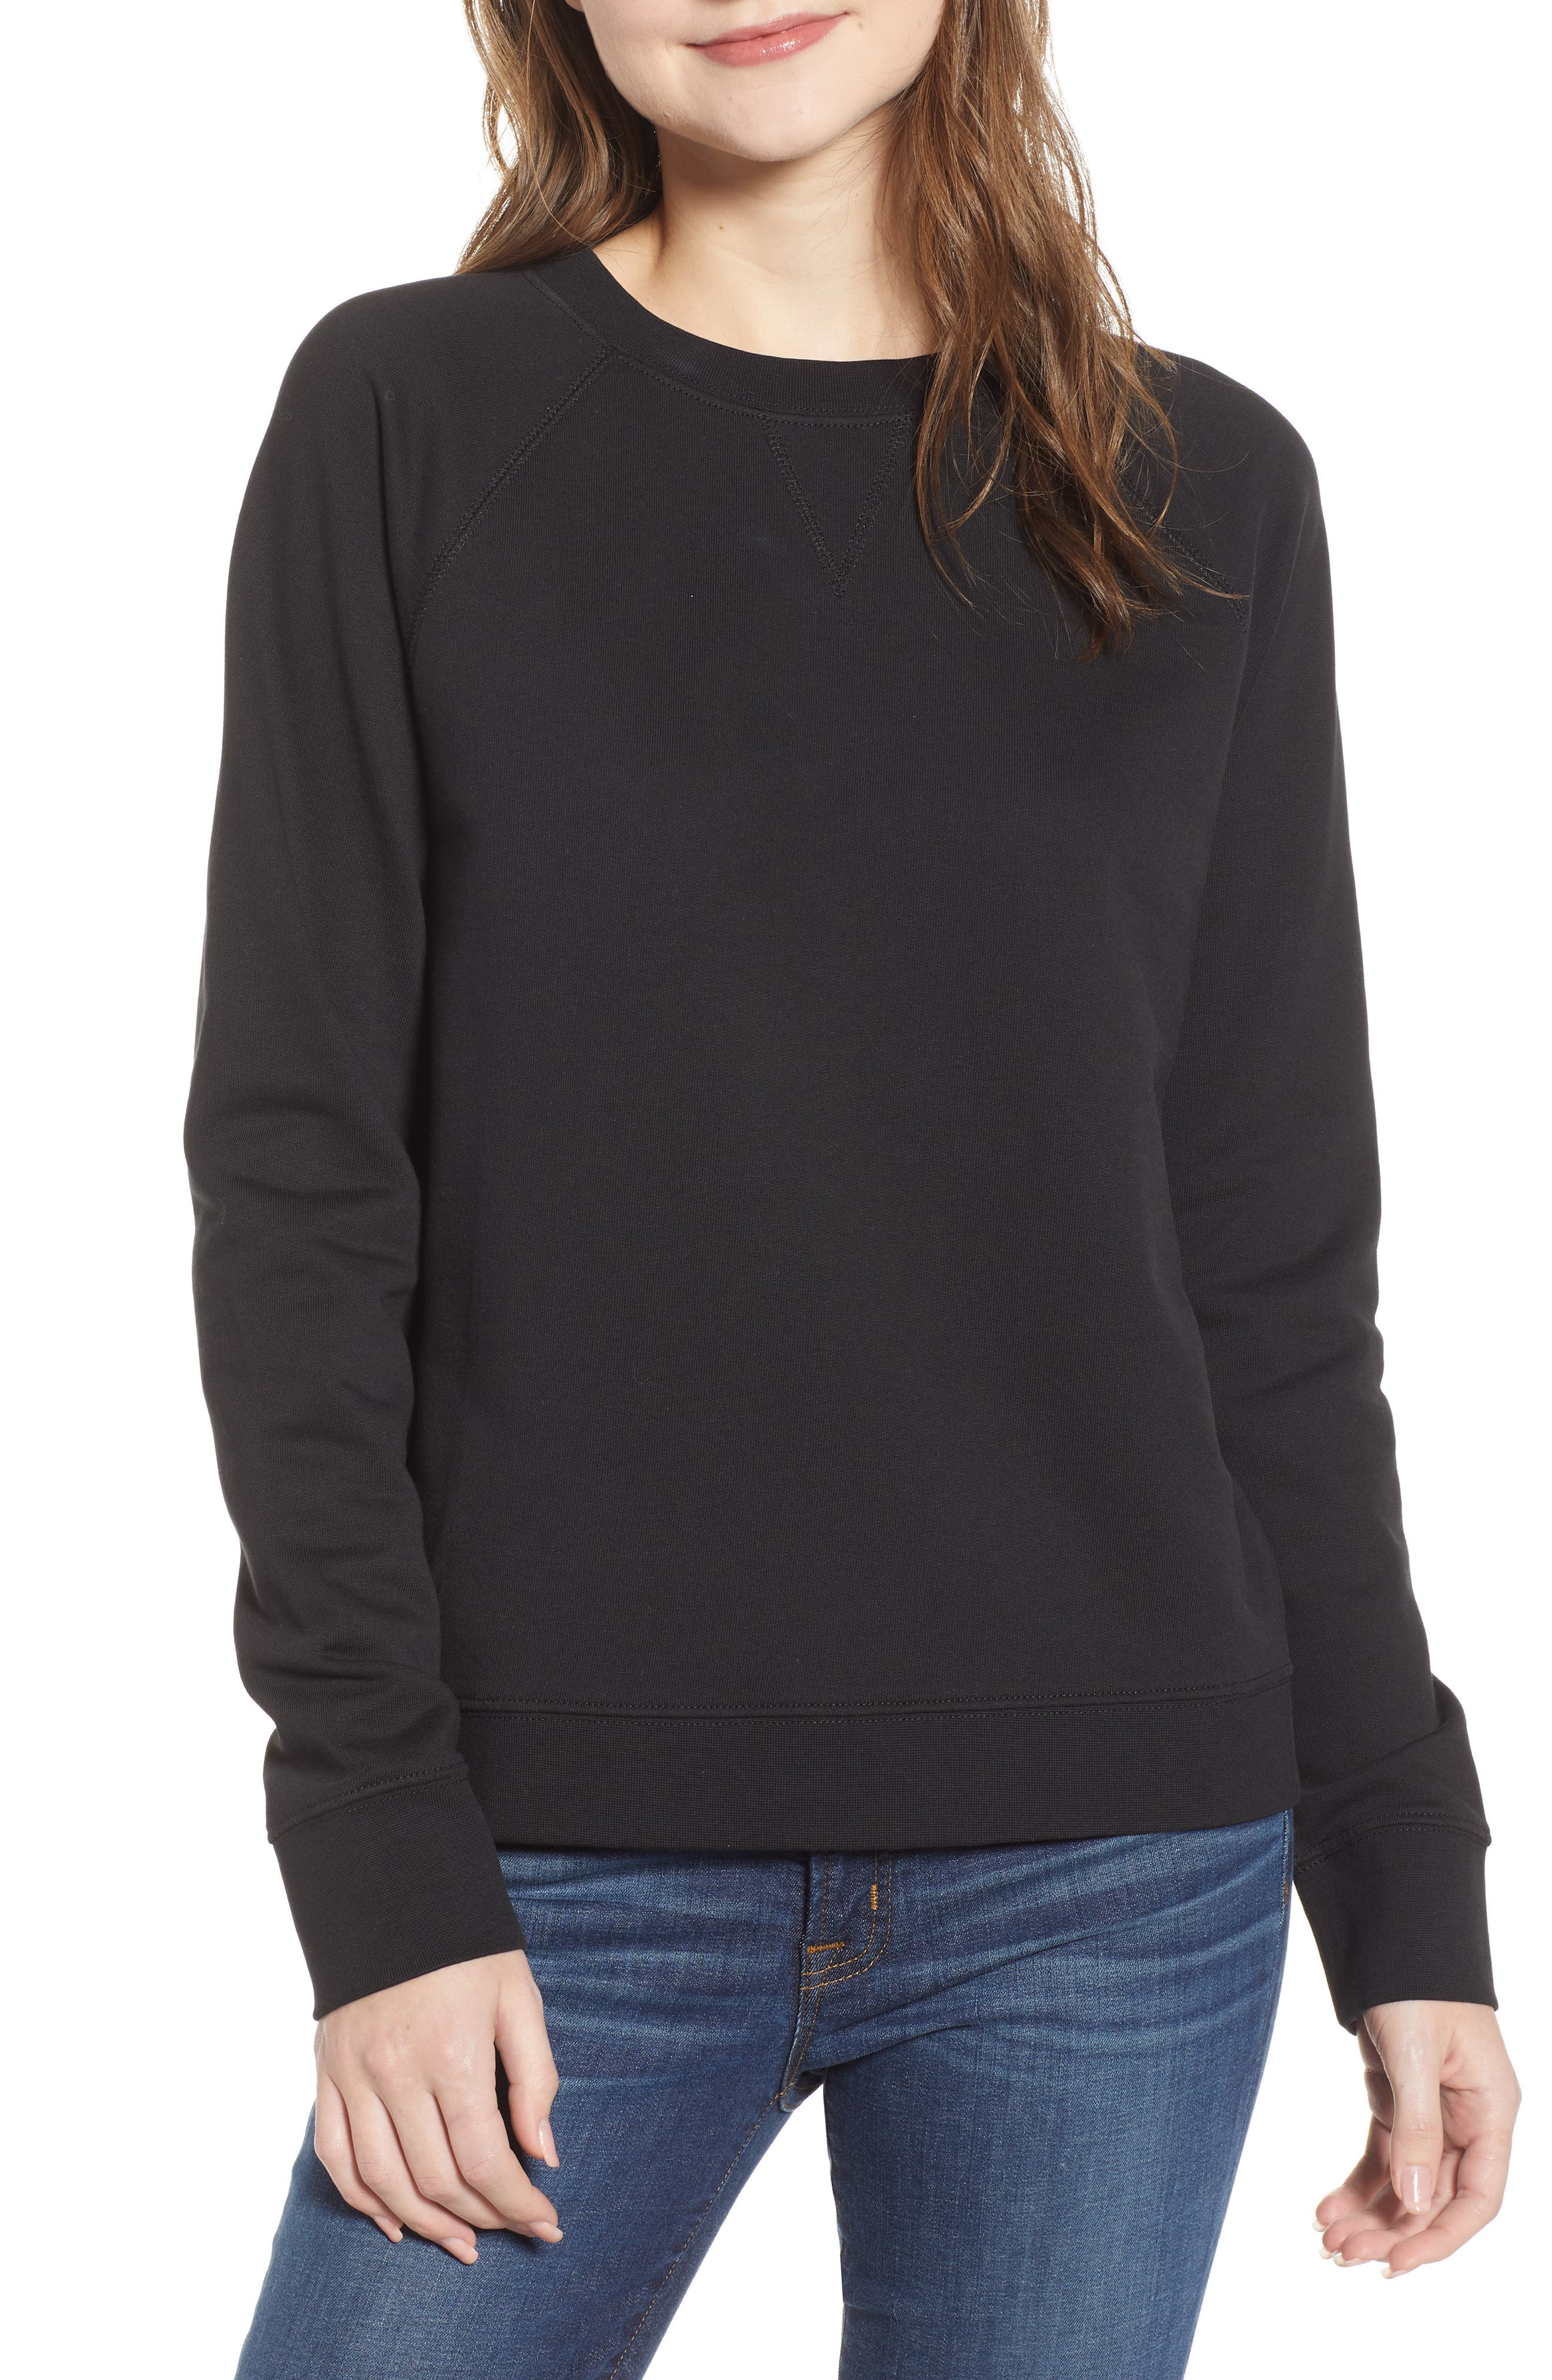 J.crew Garment Dyed Sweatshirt, Black